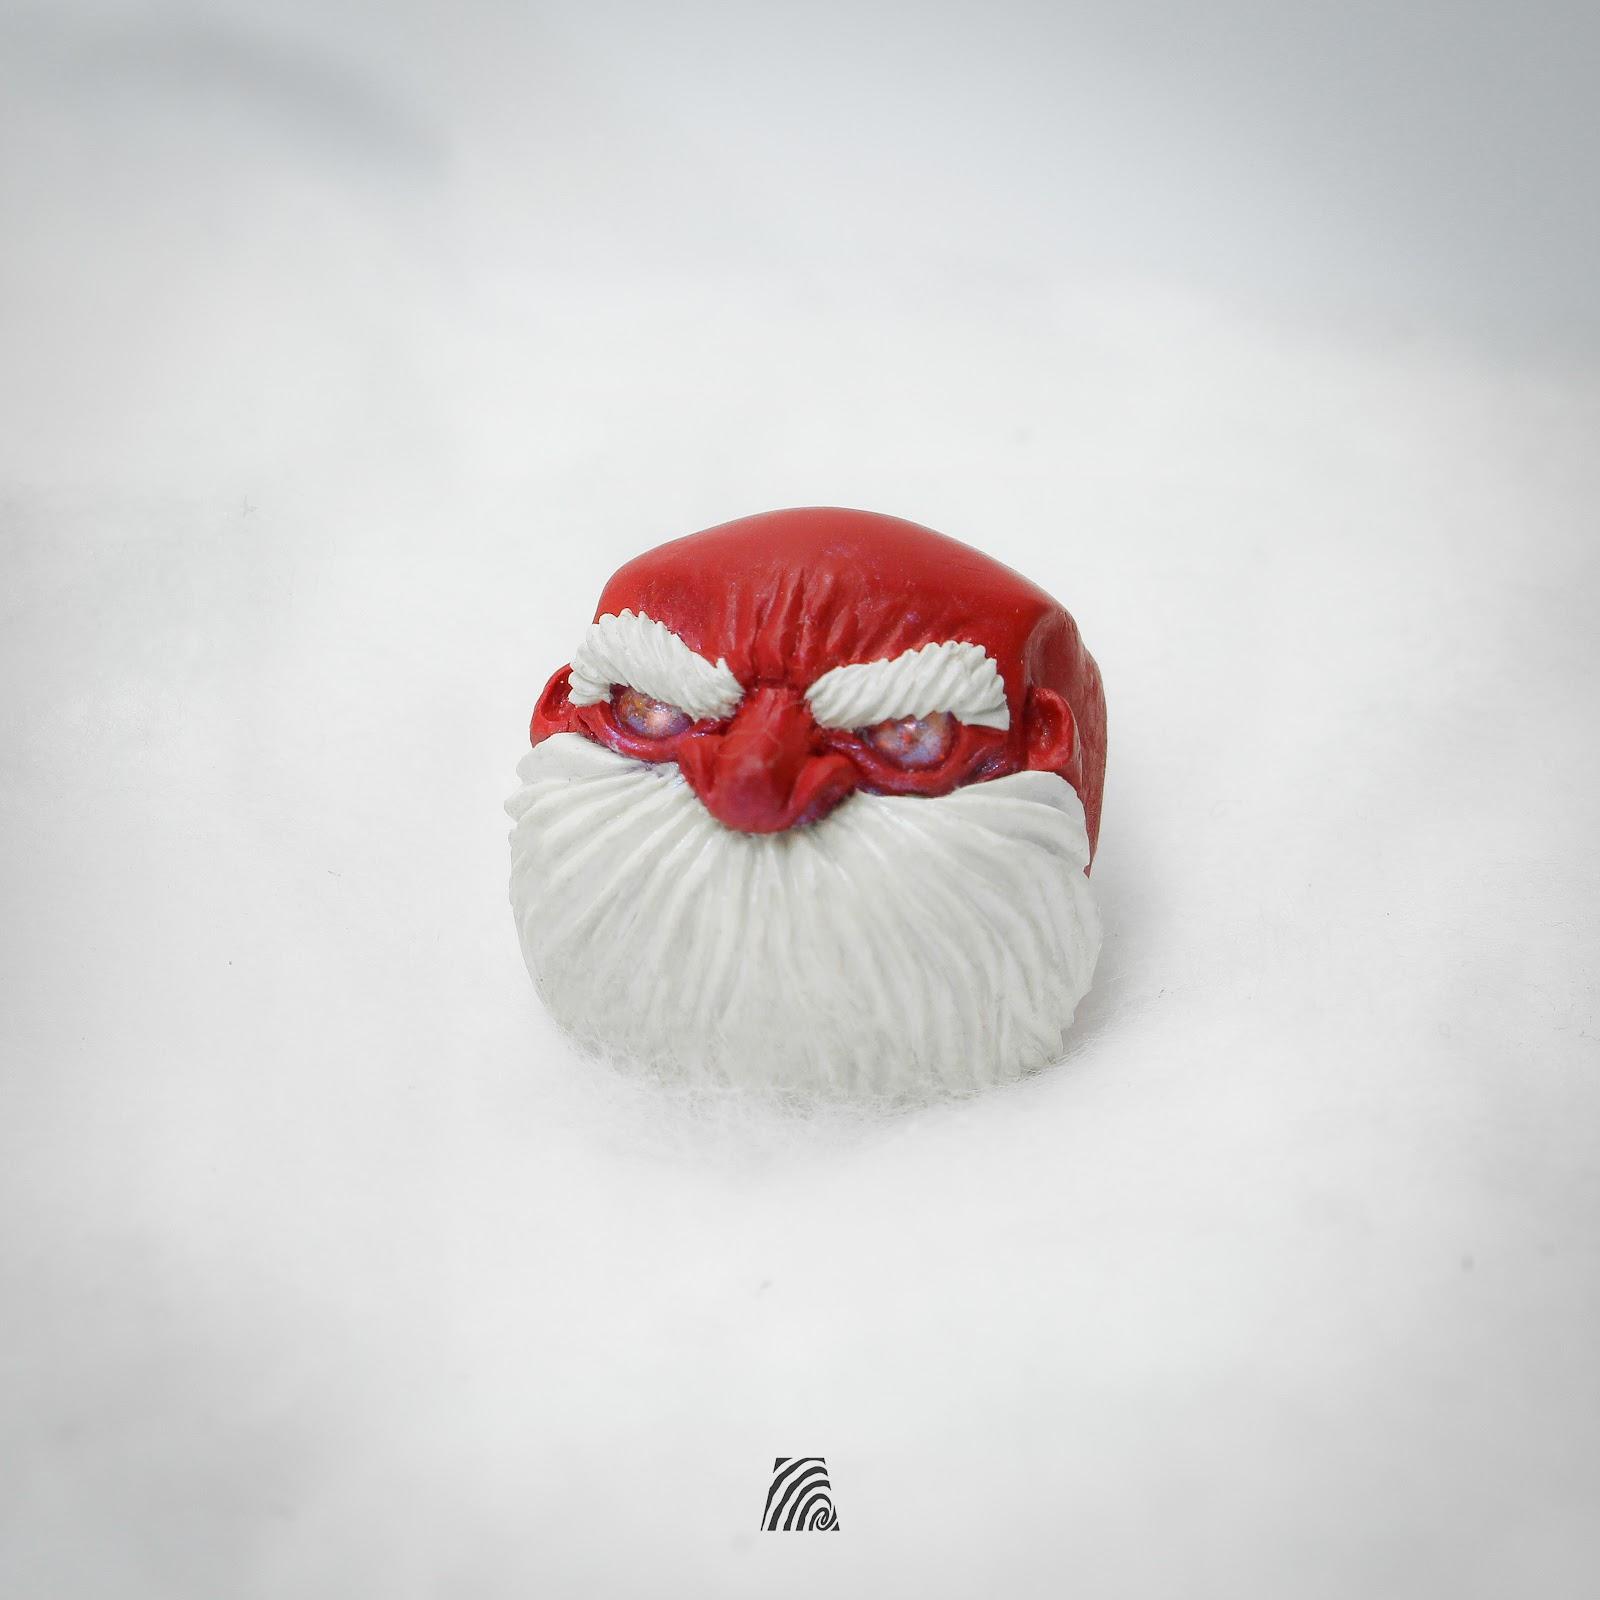 Artkey - Red Santa Jack Bald